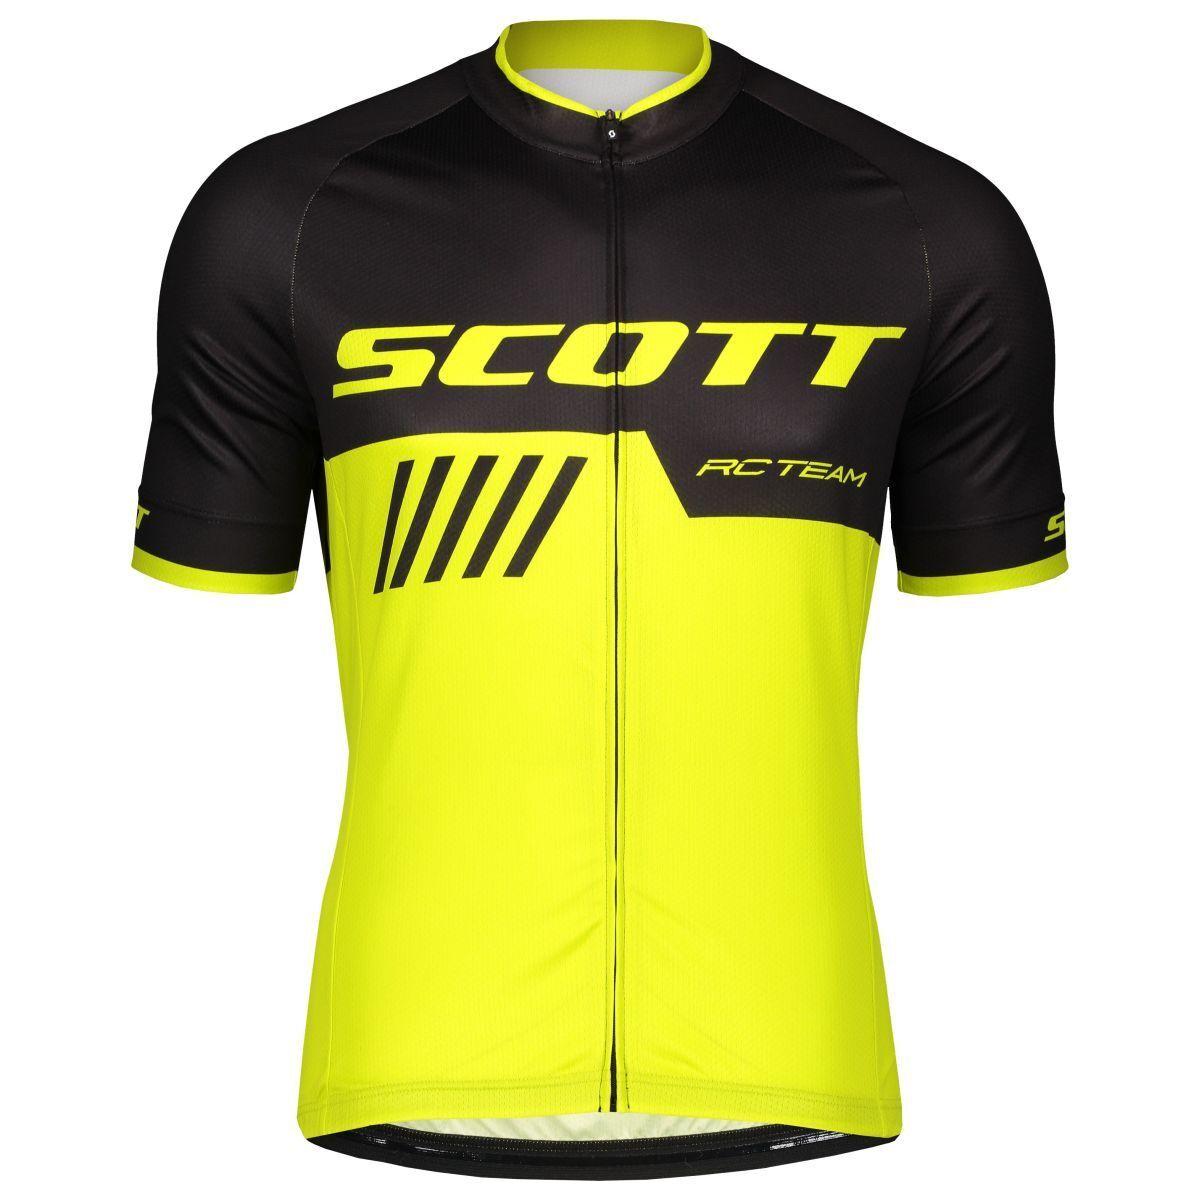 Scott RC Team 10 Fahrrad Trikot kurz gelb/schwarz gelb/schwarz kurz 2019 84e190